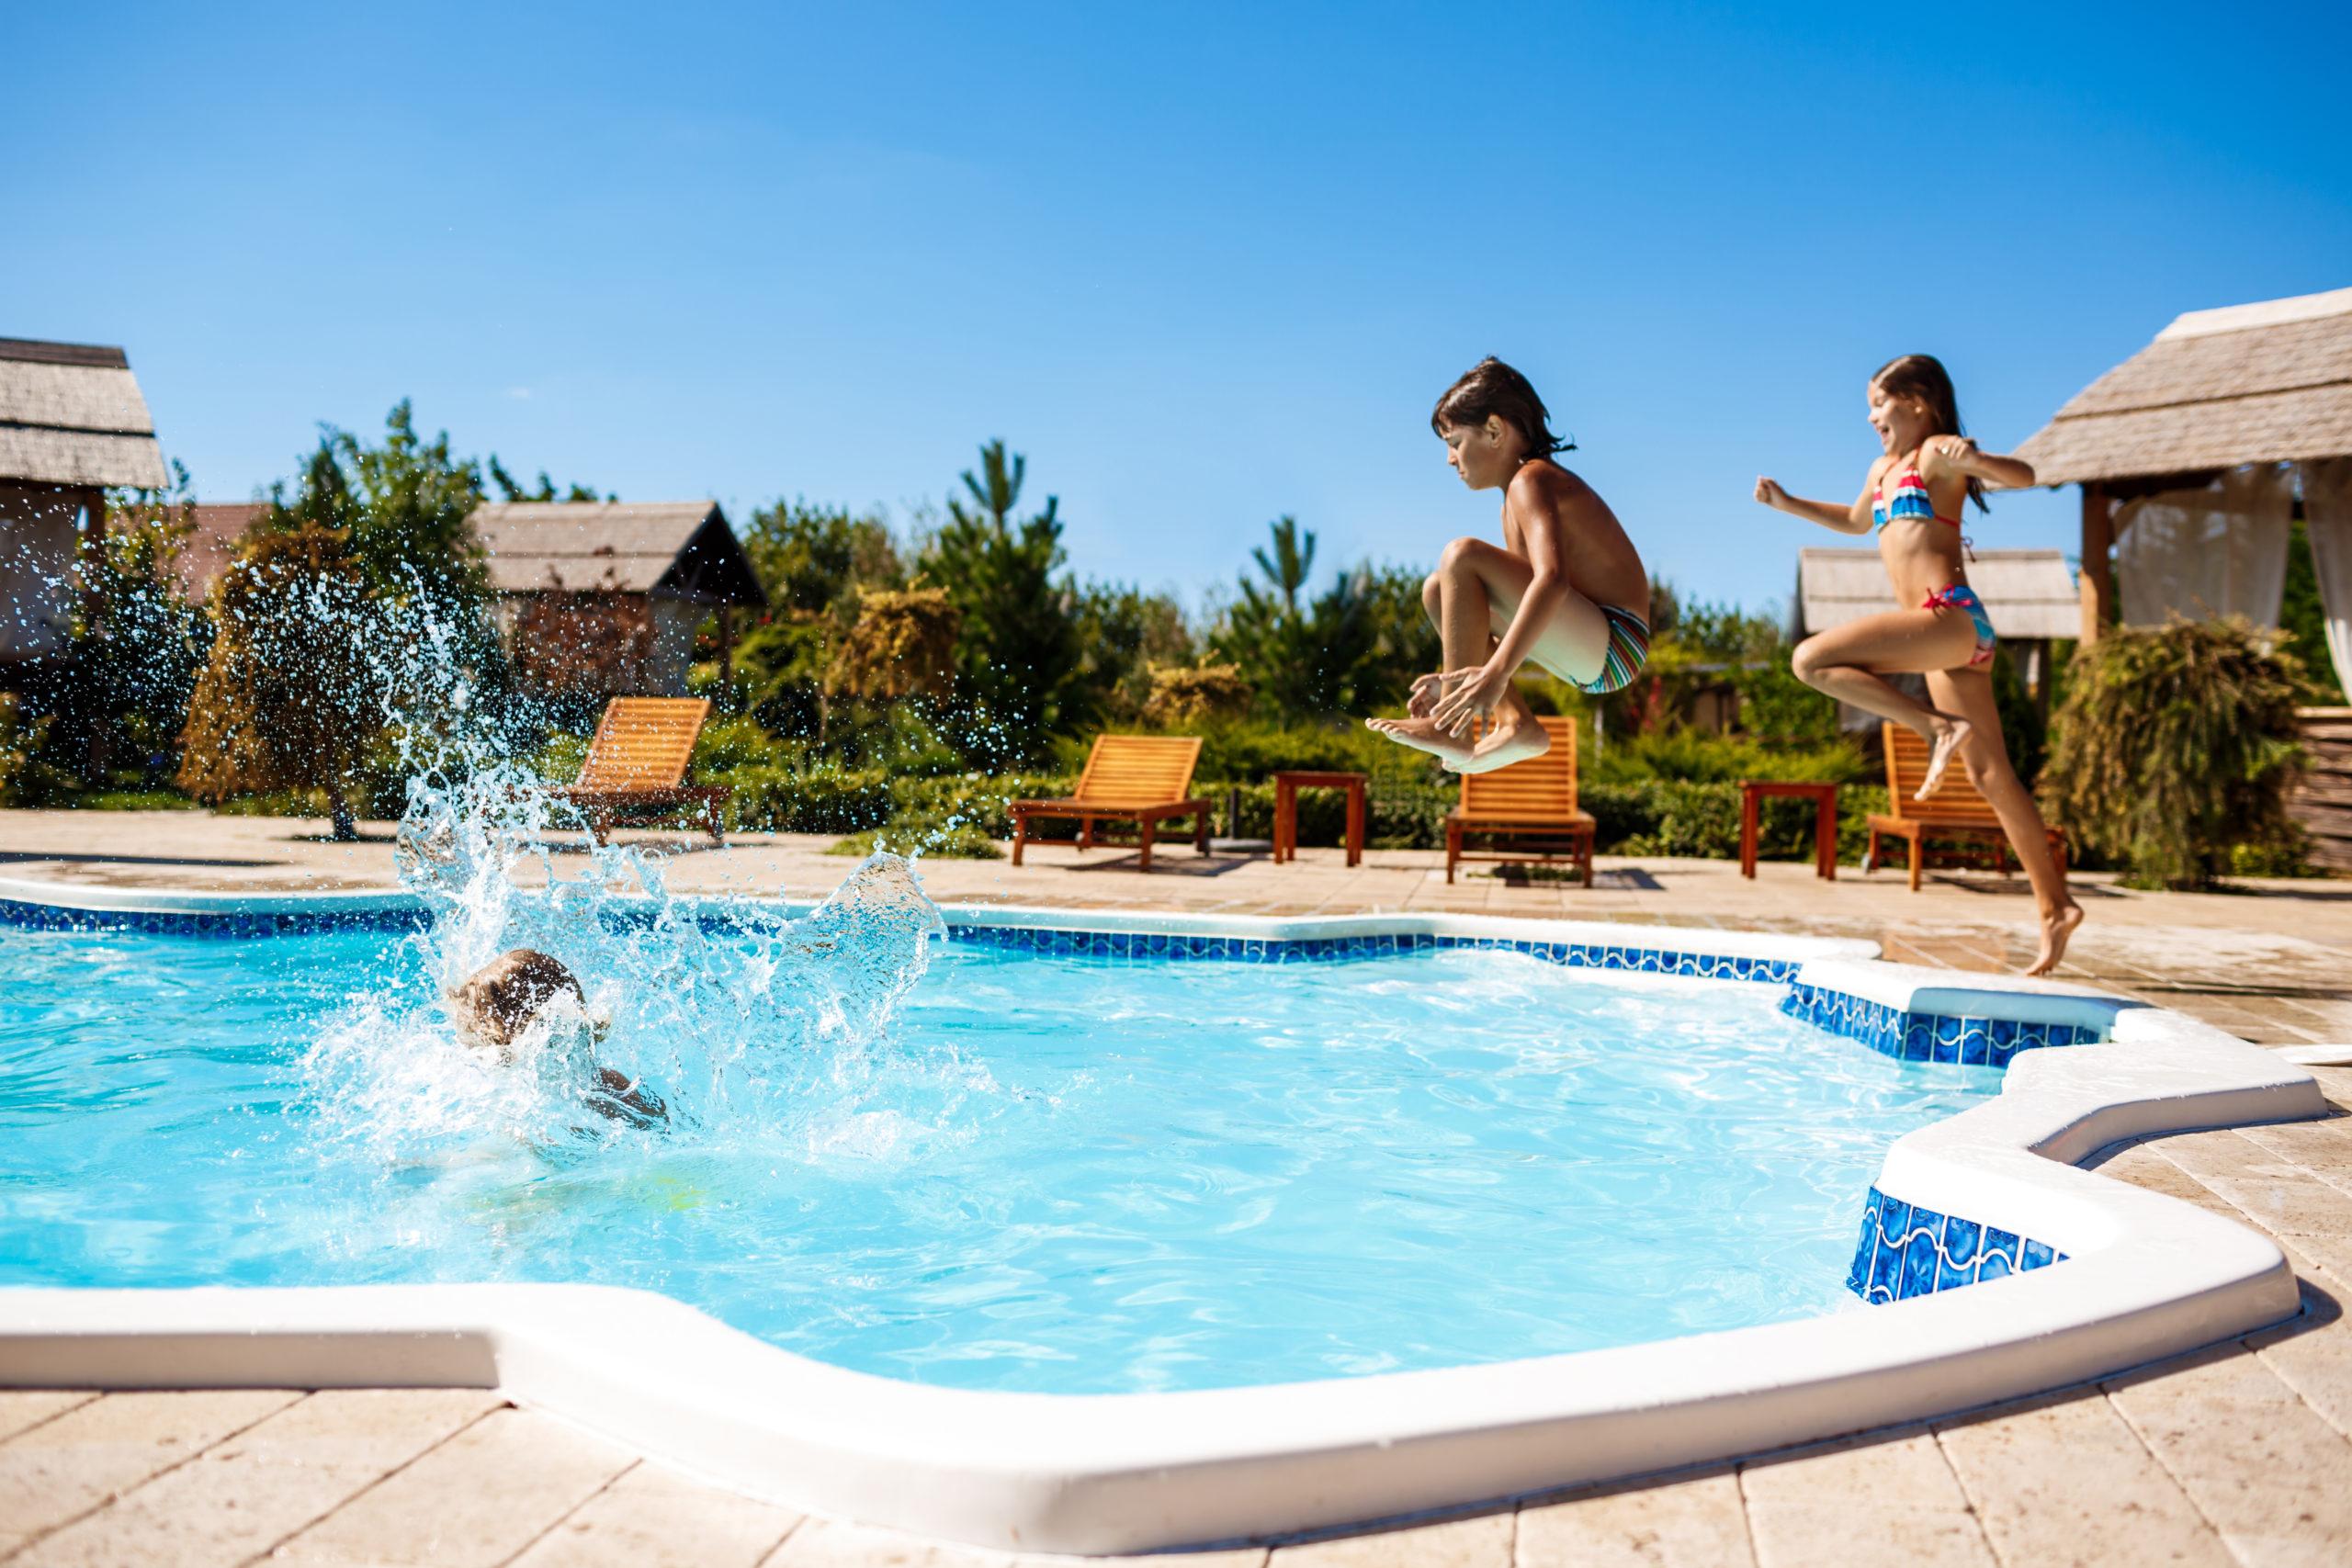 Reindesa_puesta_a_punto_piscina